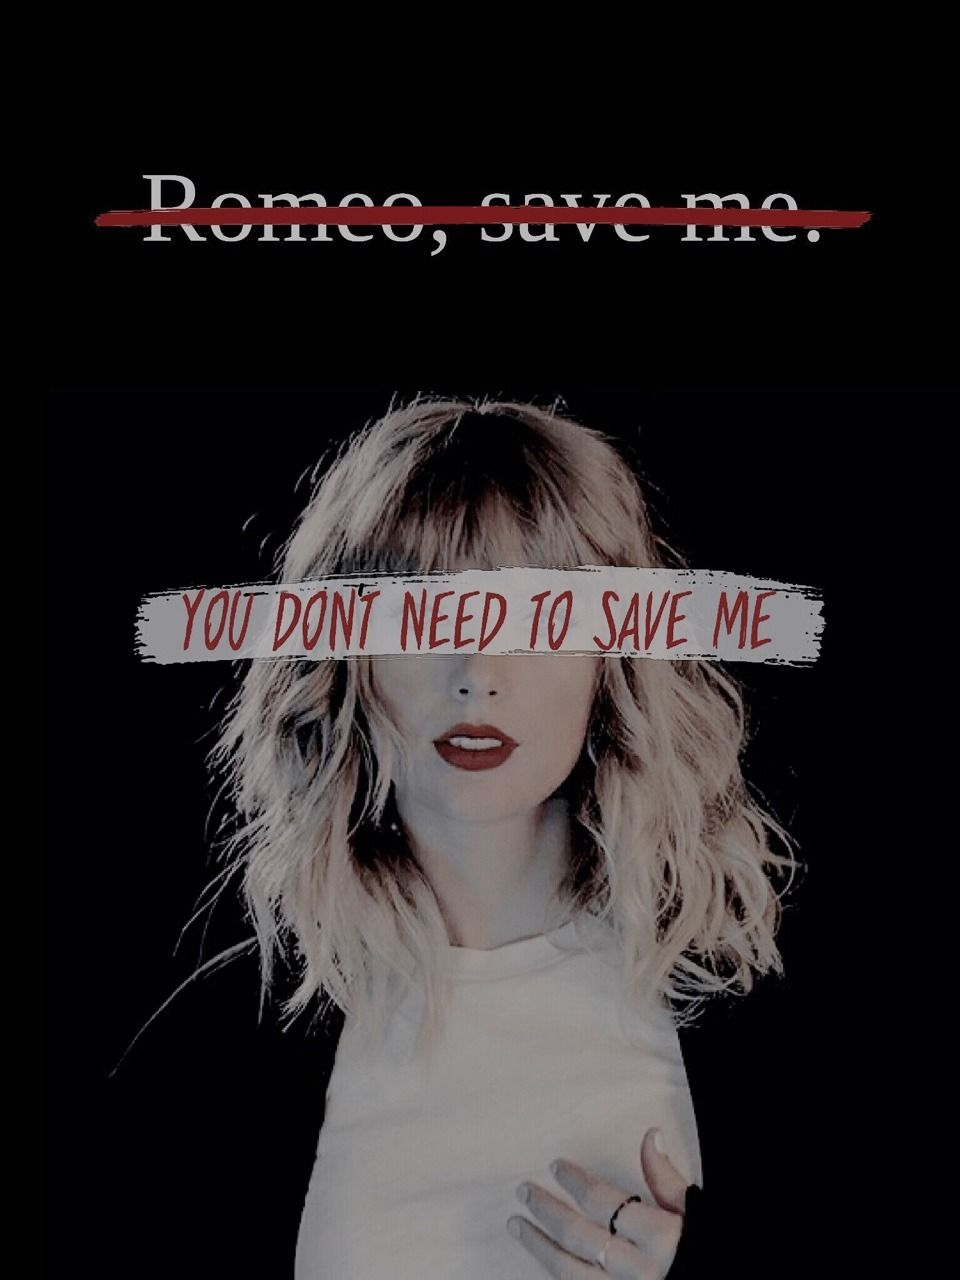 Call It What You Want Taylor Swift Musicas Trechos De